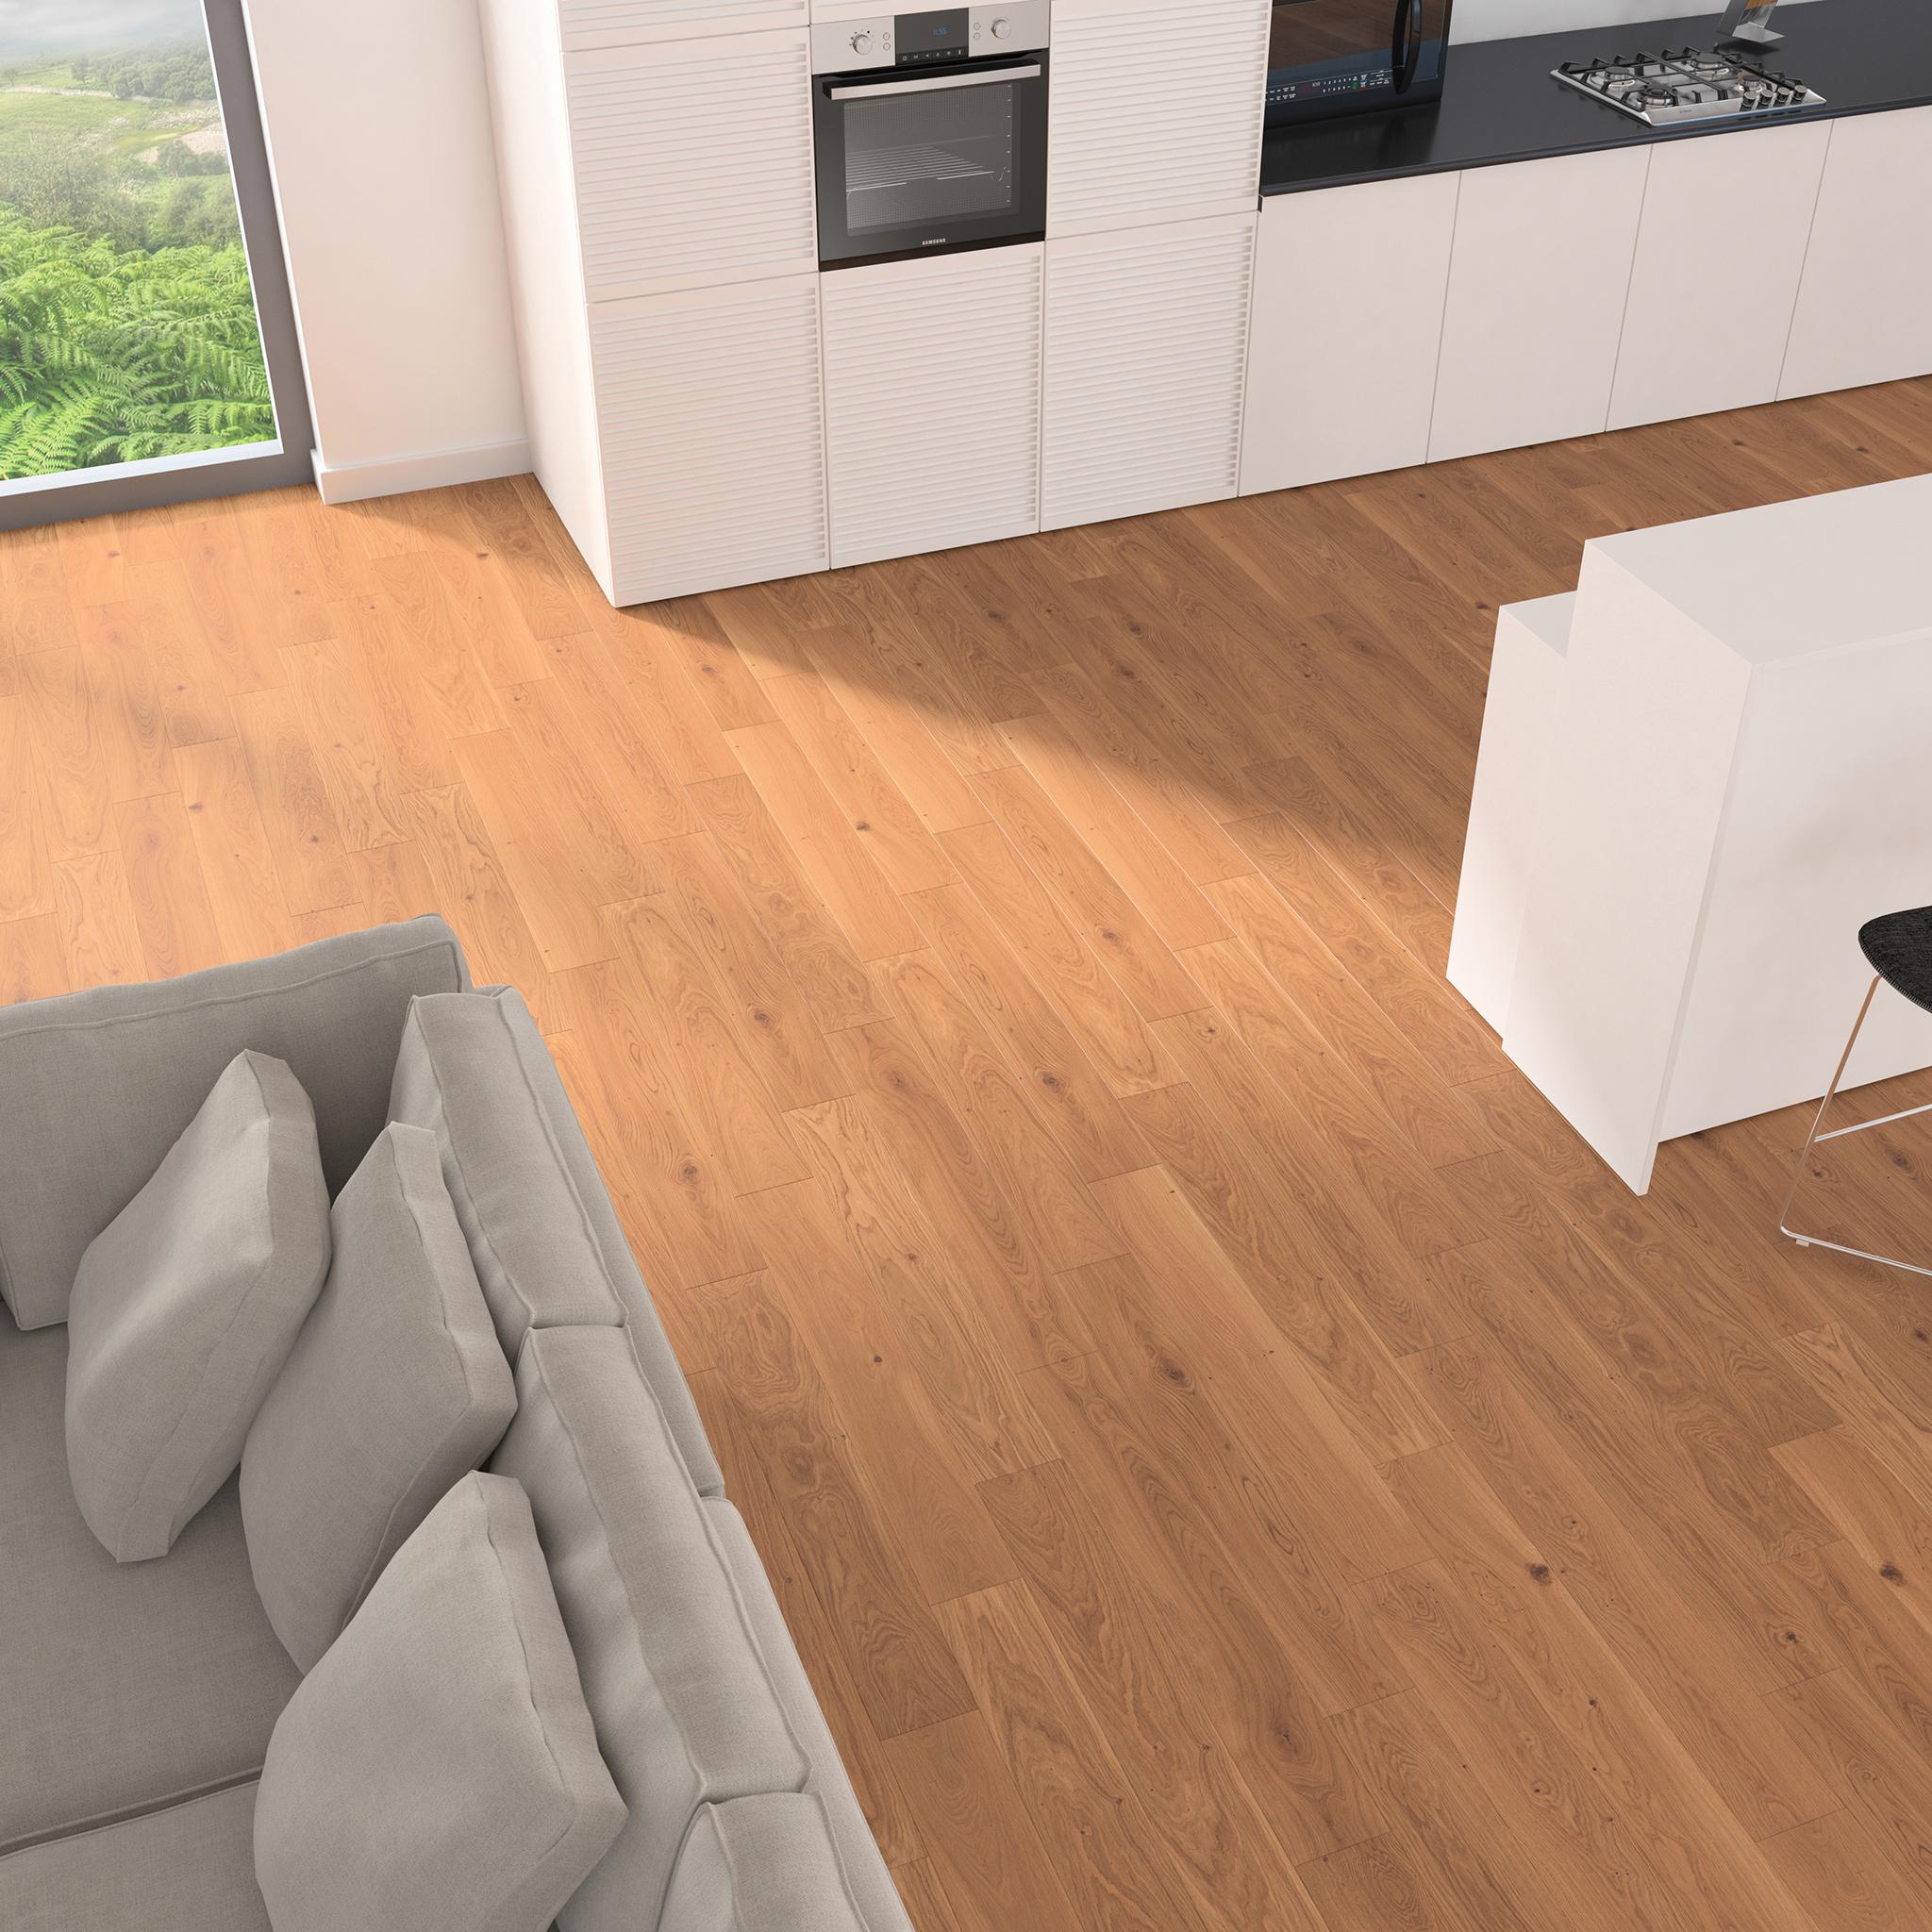 Floor-Art Da Vinci Eiche Rustikal